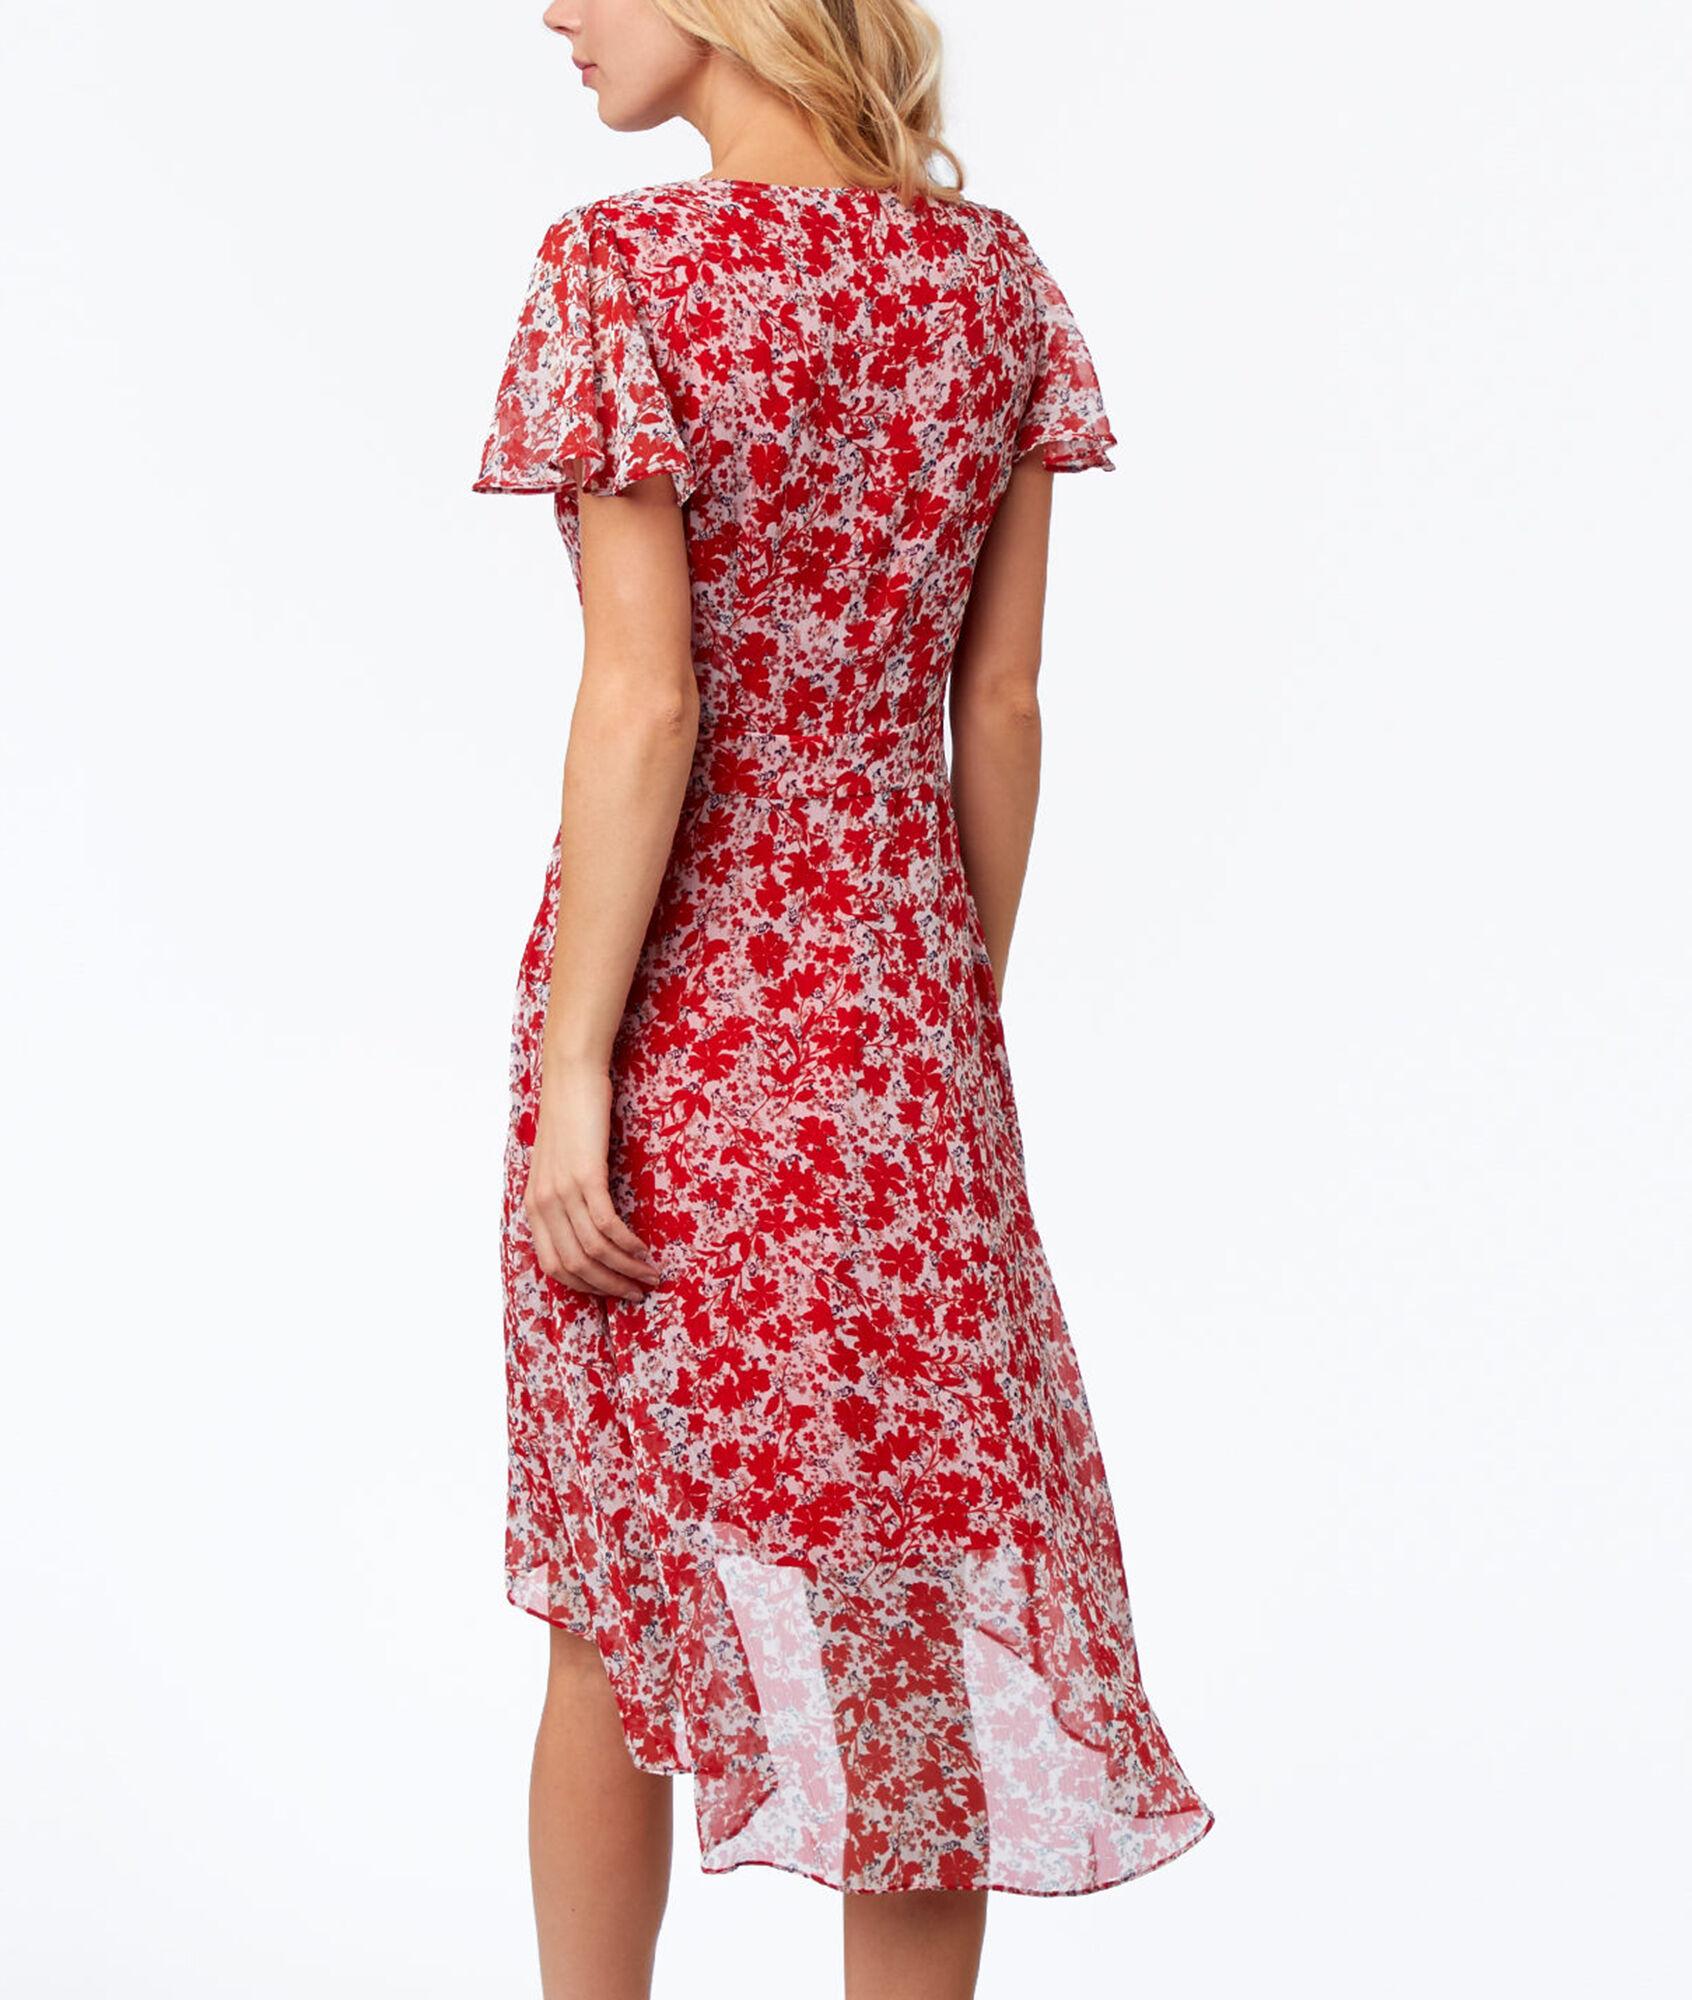 robe imprim e fleurs fleury rouge etam. Black Bedroom Furniture Sets. Home Design Ideas